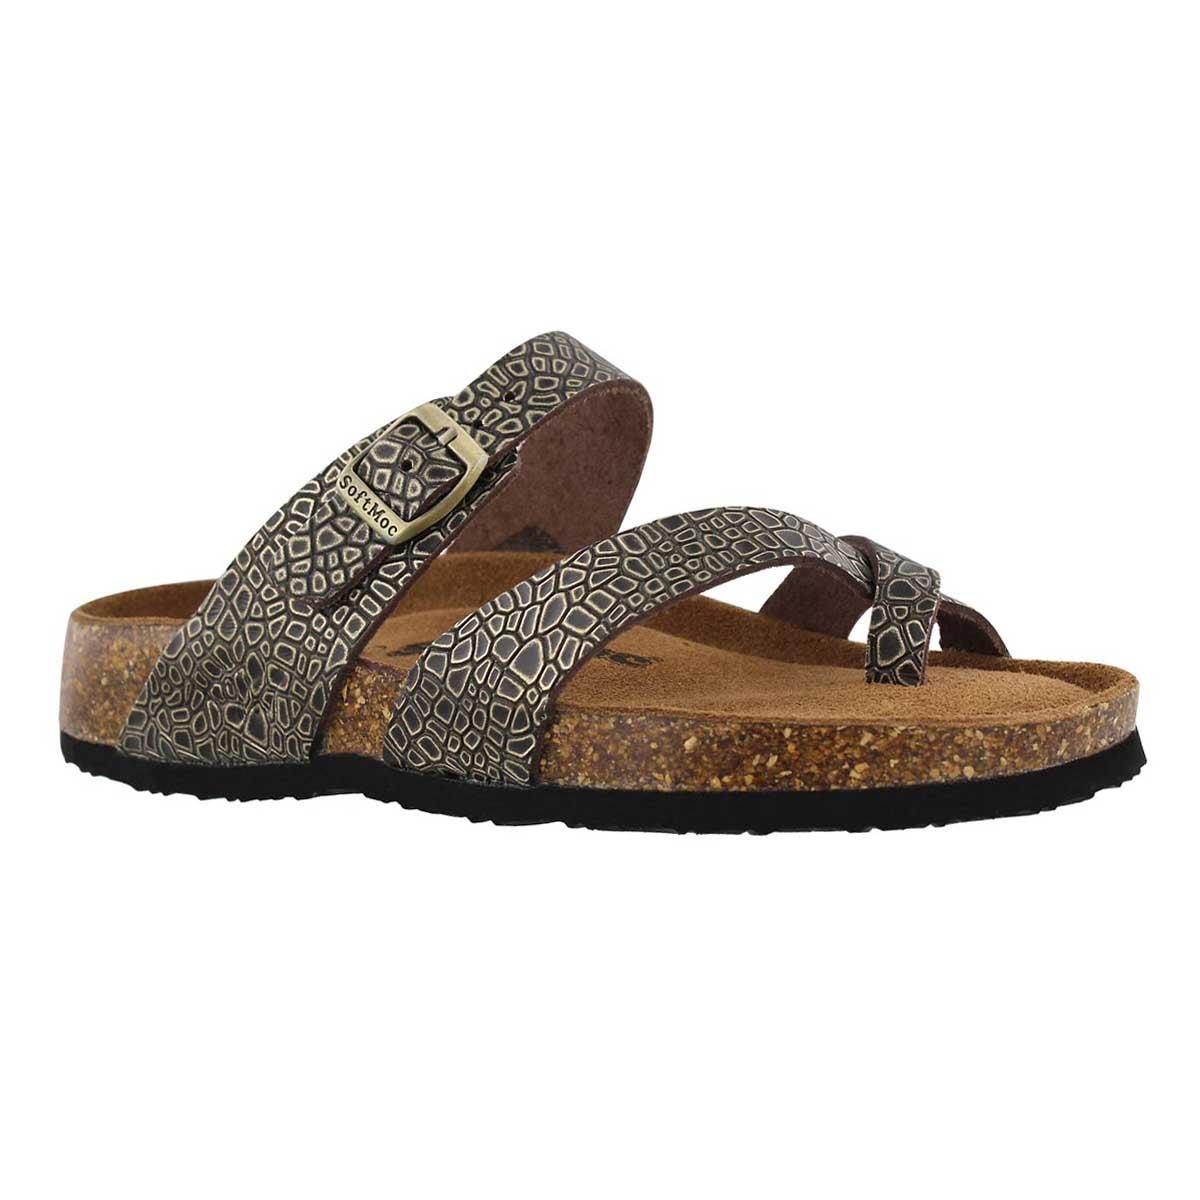 Women's ALICIA 5 gold embossed memory foam sandals